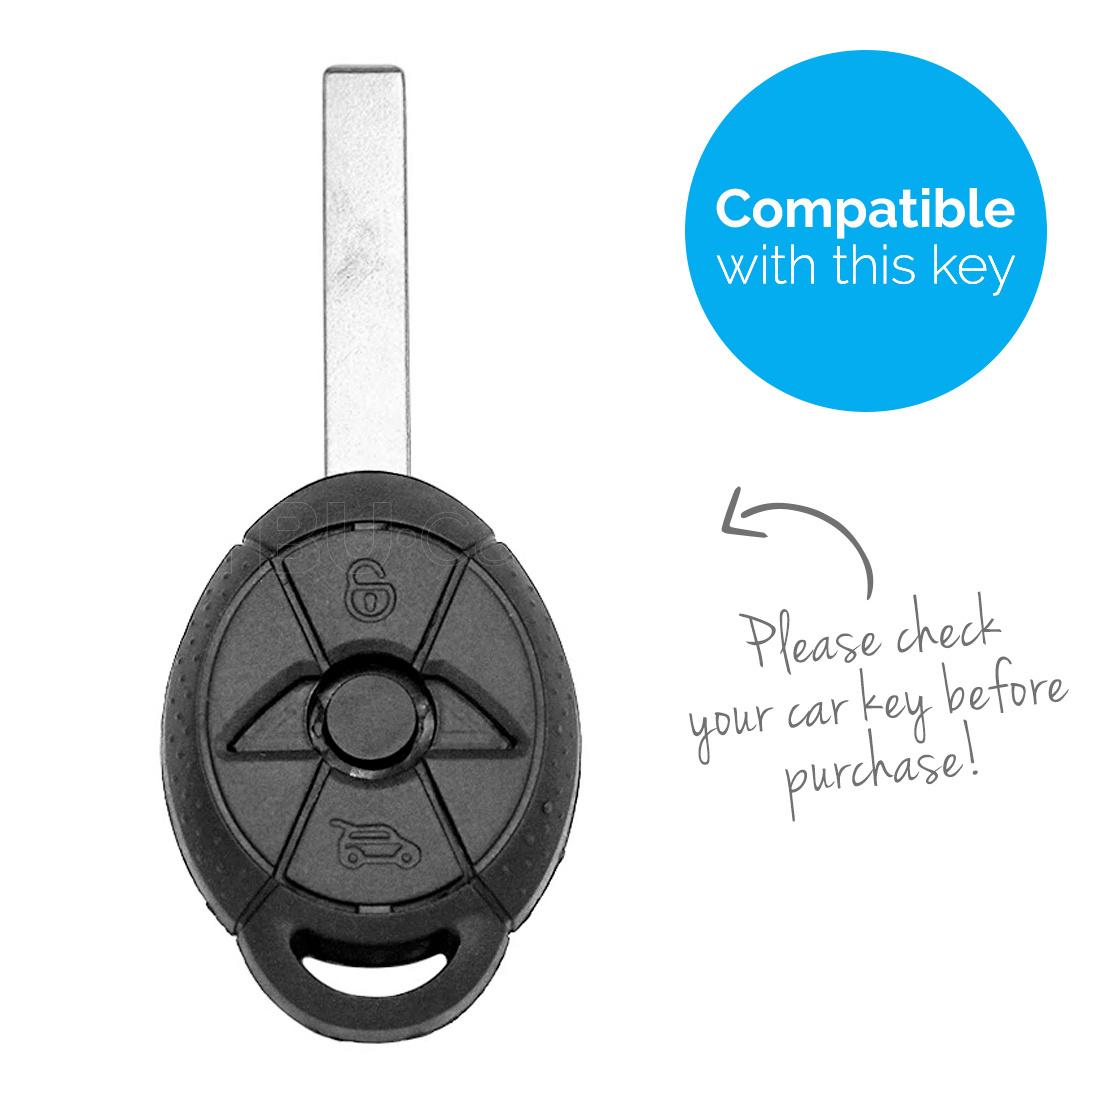 TBU car TBU car Sleutel cover compatibel met Mini - Silicone sleutelhoesje - beschermhoesje autosleutel - Blauw